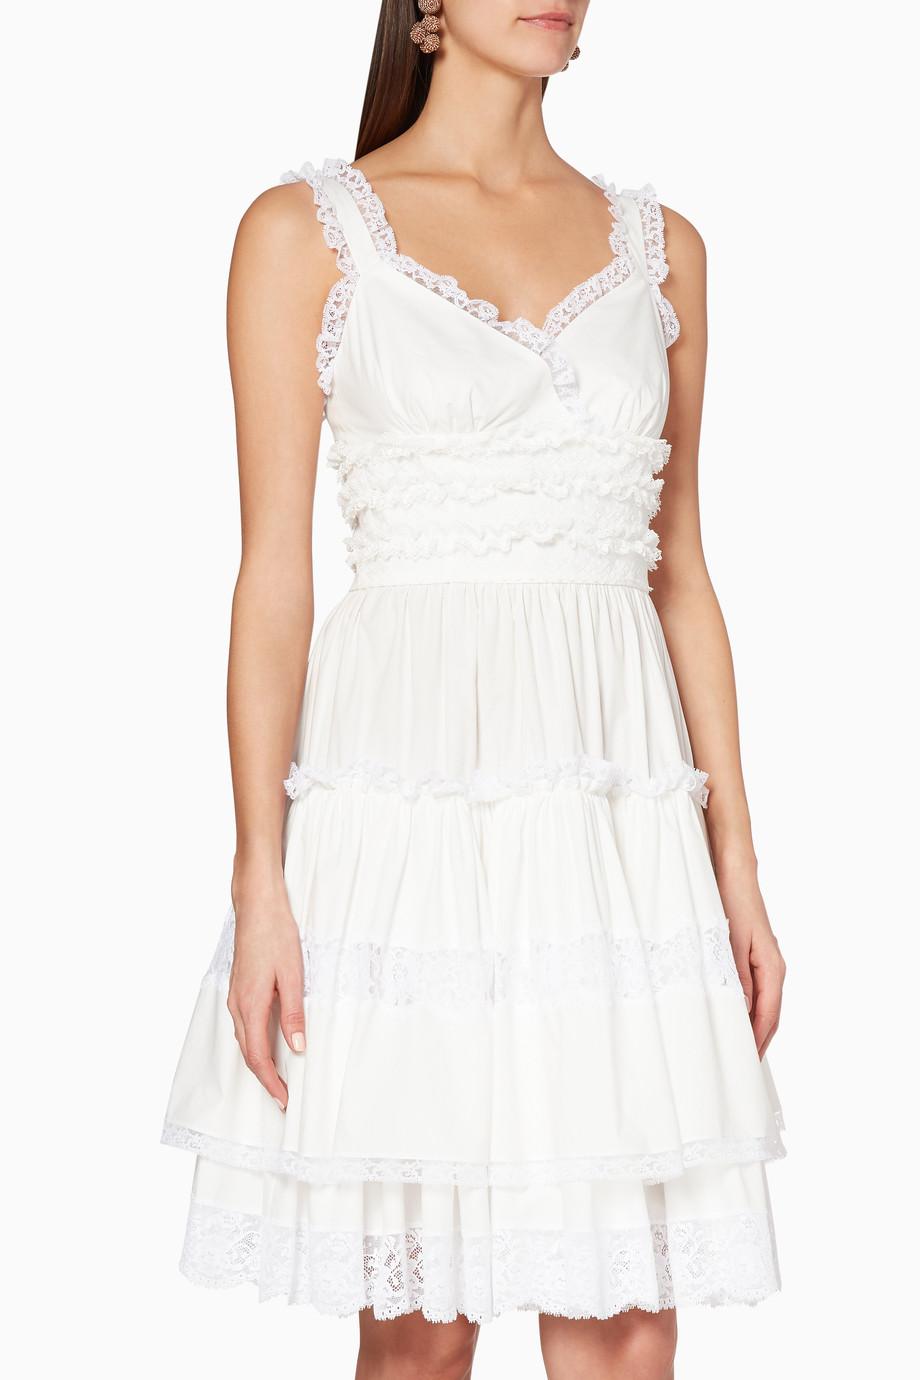 139b83d80b1 Shop Dolce   Gabbana White White Poplin Lace Frill Dress for Women ...